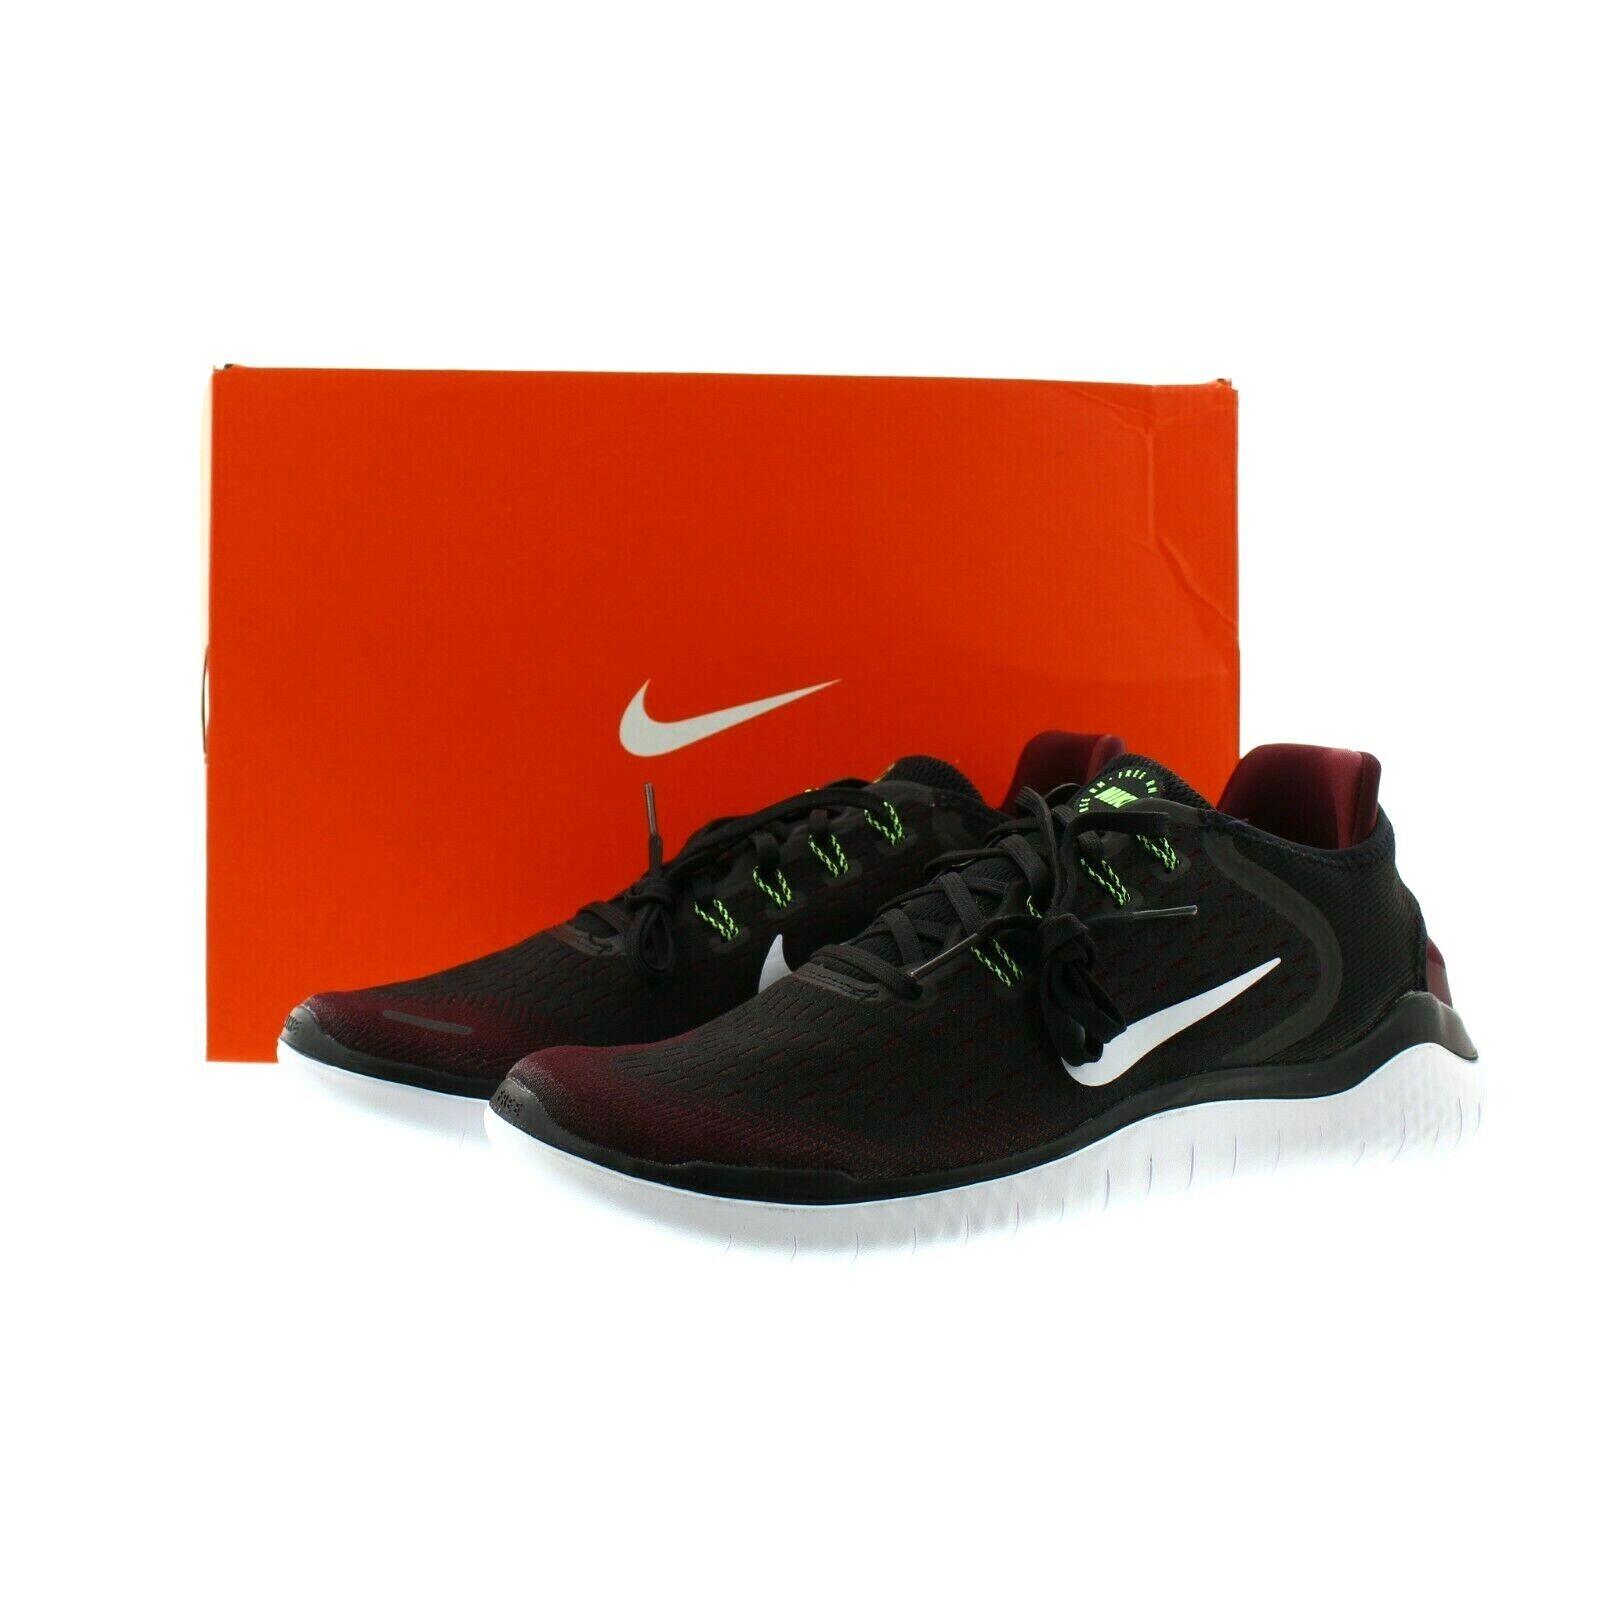 Superfly Ultra 90 Max Air Nike 7.5 Sz Men's Tinker 850613